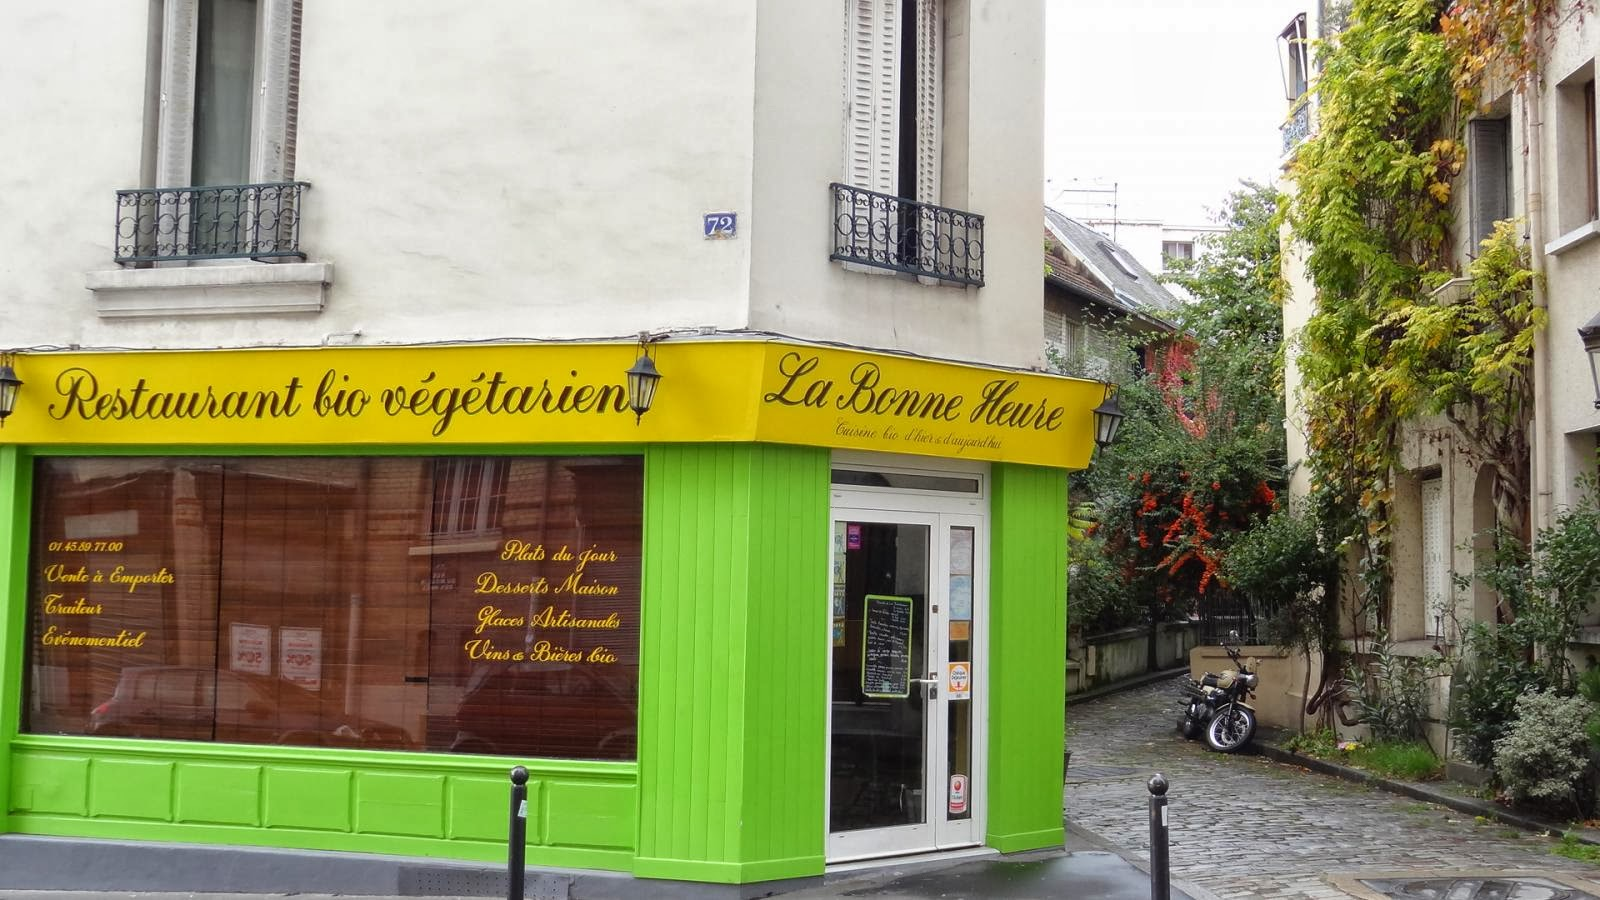 green h tels paris 13 ex hotel le cantagrel paris hotel logis restaurant bio paris. Black Bedroom Furniture Sets. Home Design Ideas